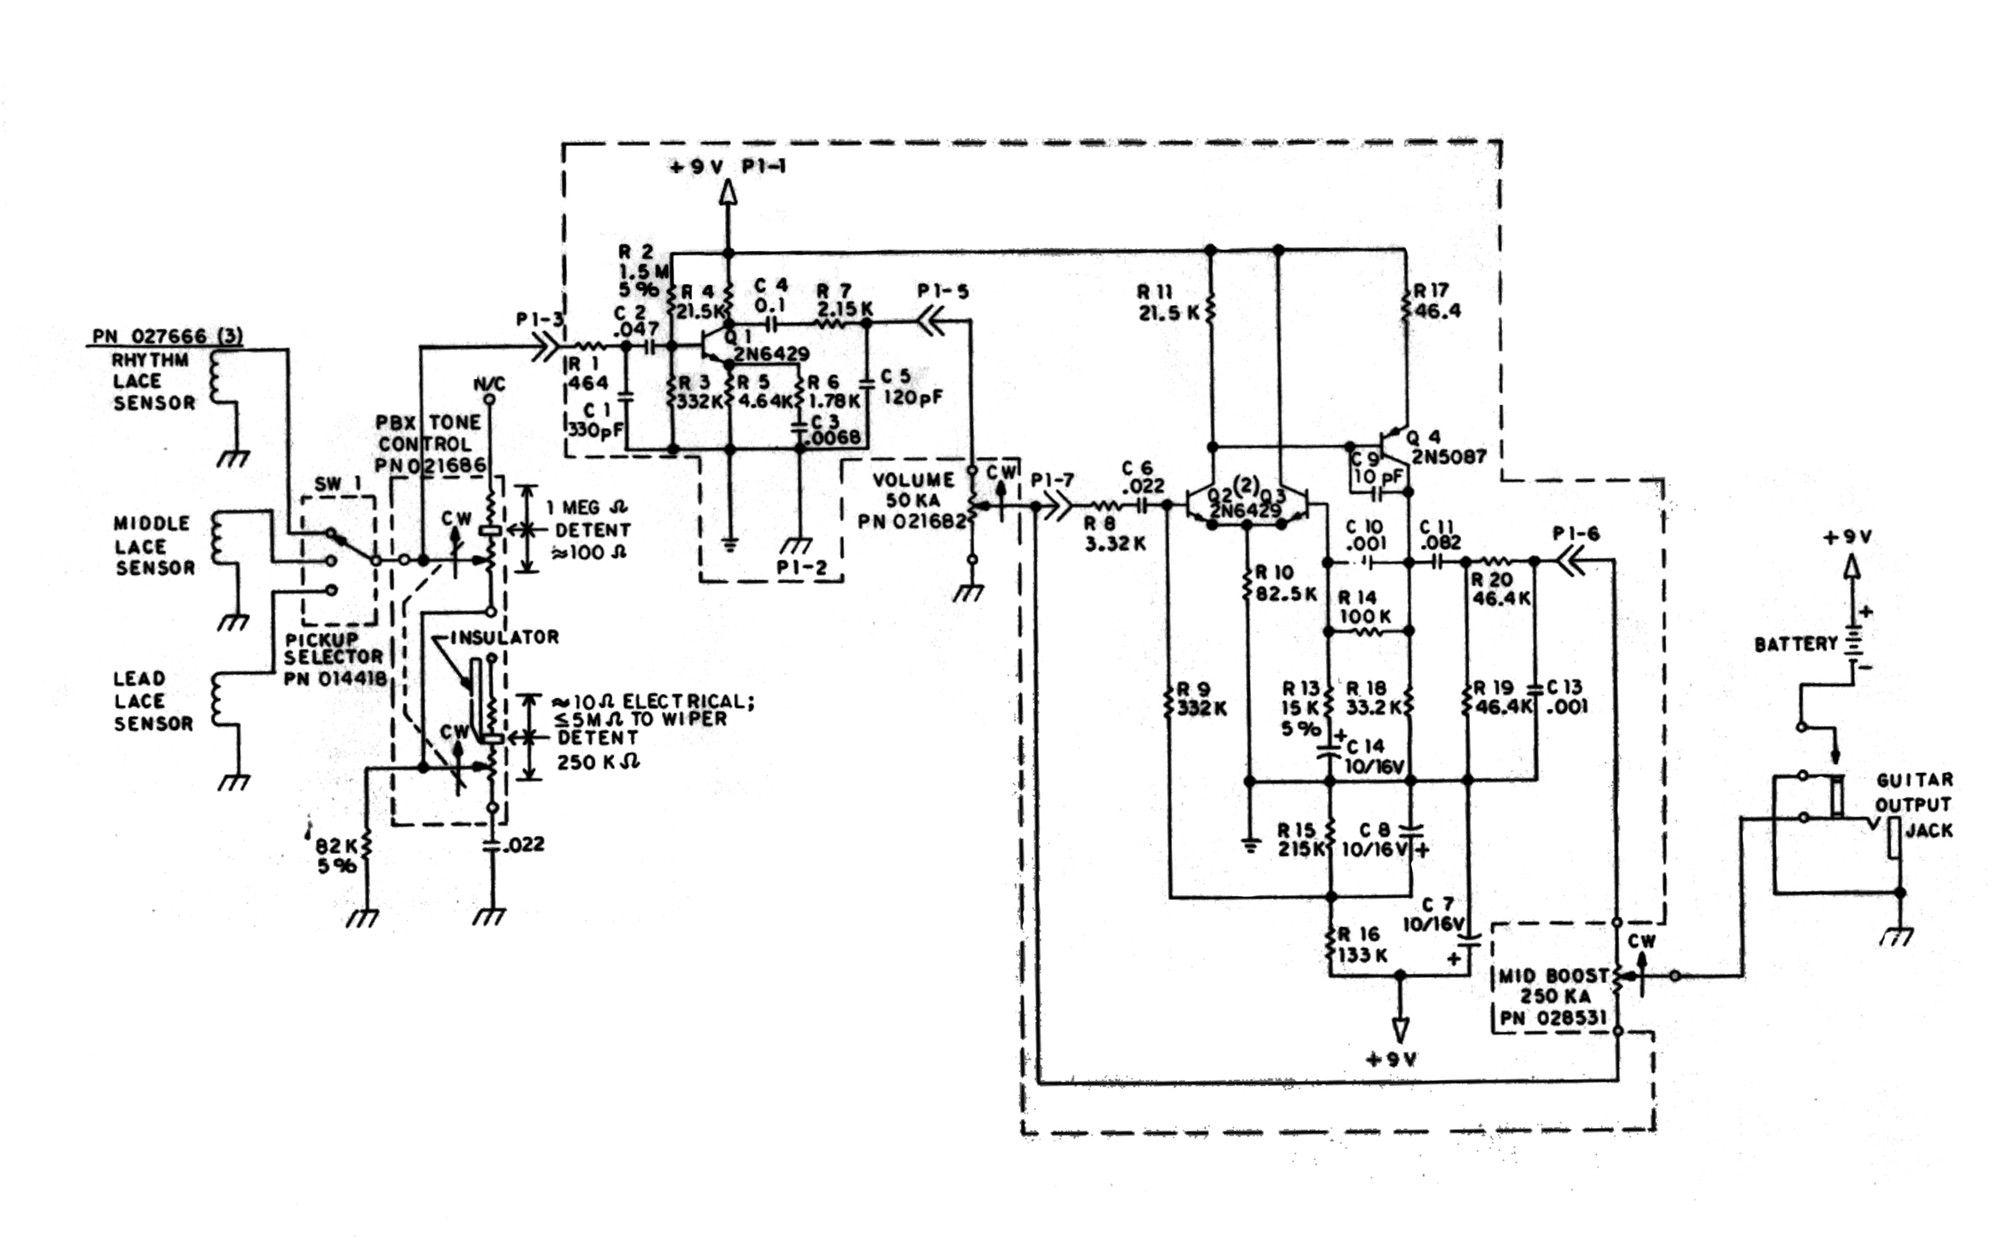 74 fender jazz b wiring diagram